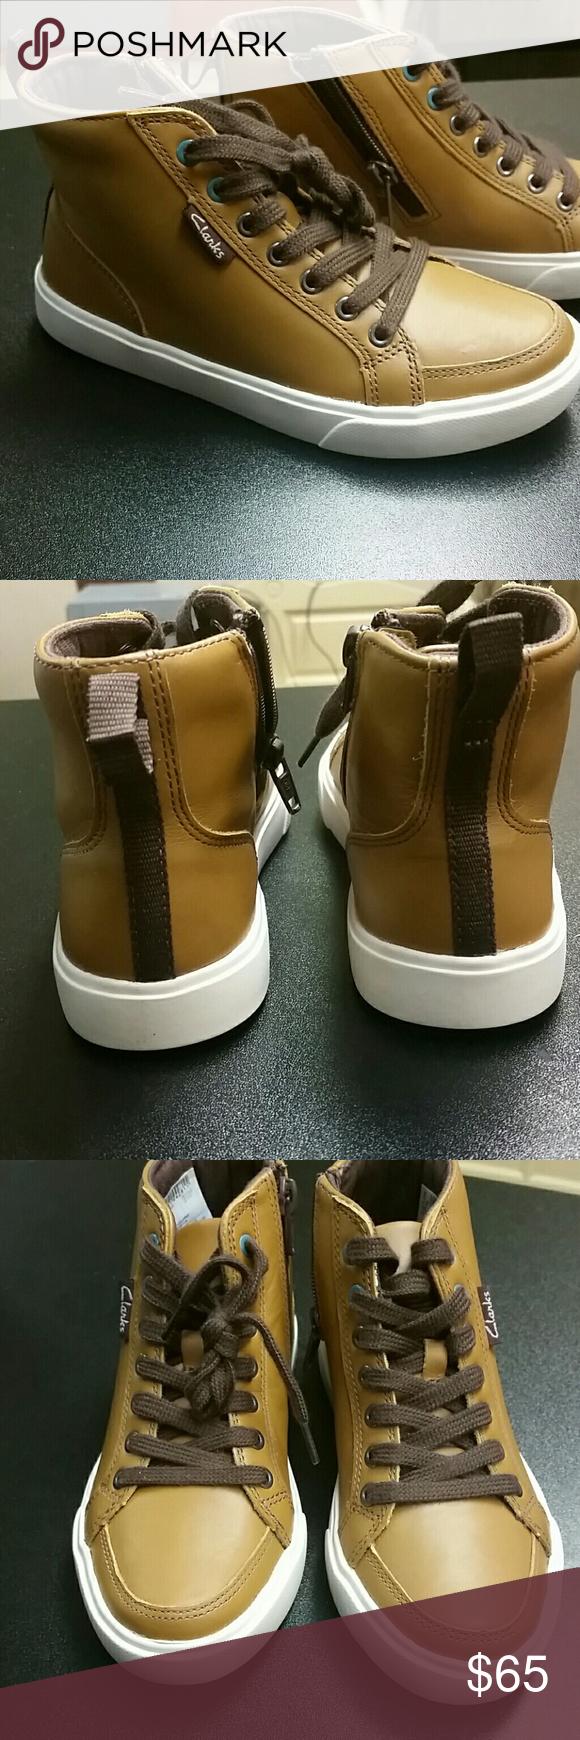 Boys boot sneaker clarks Tan leather